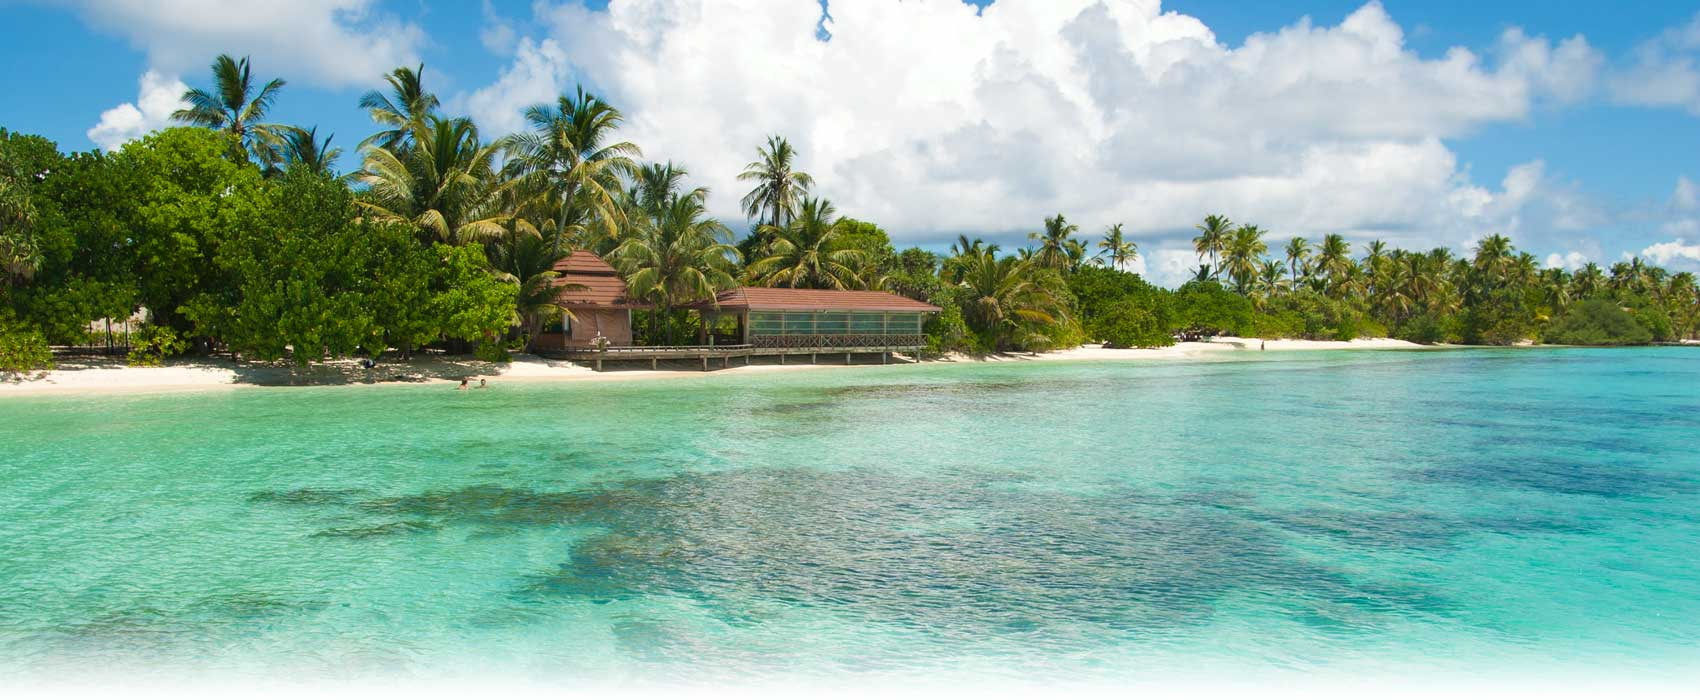 Download this Finden Folgende Bilder Kuramathi Island Resort picture